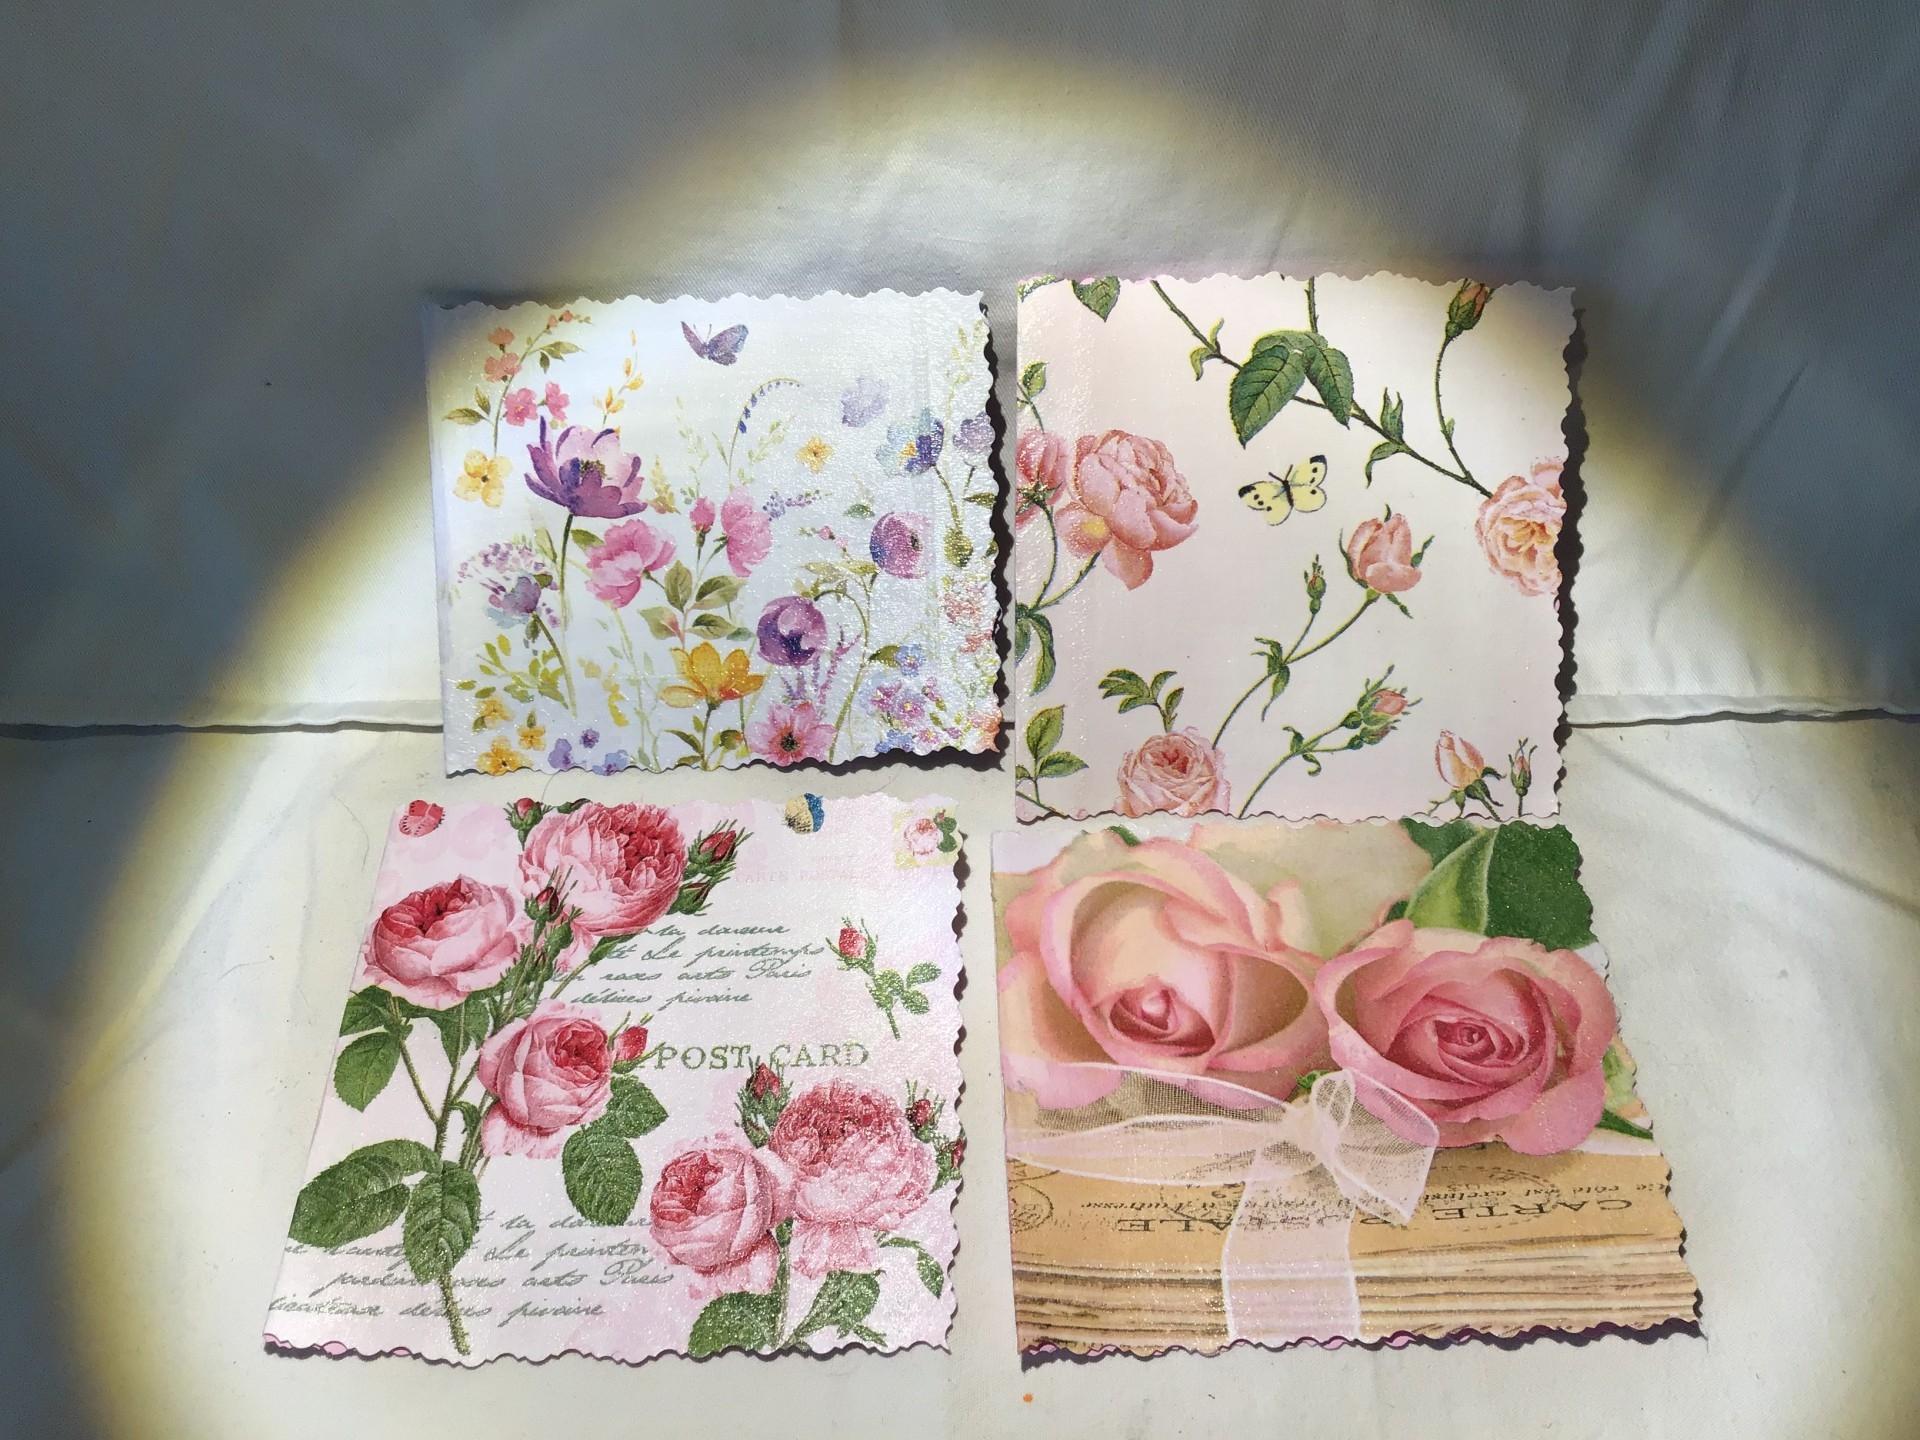 Séries de petites cartes